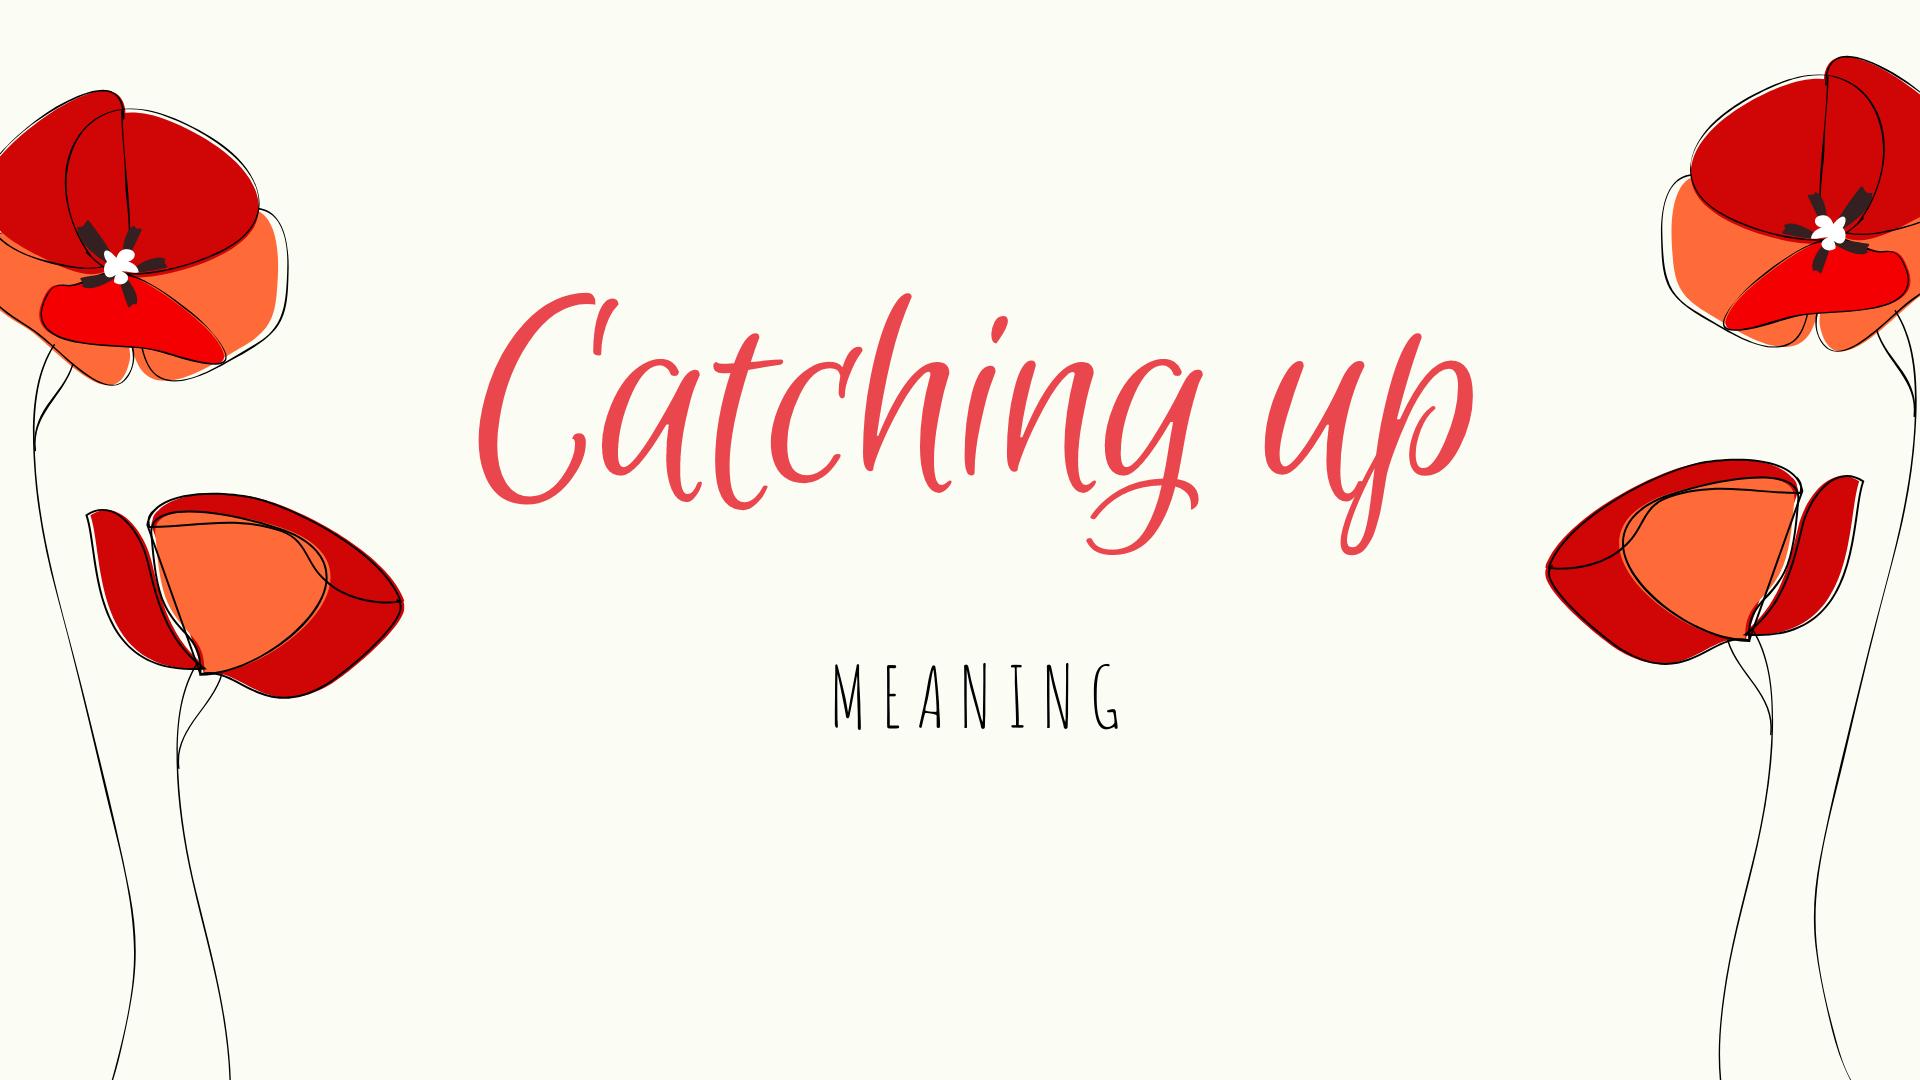 Catch-up-la-gi